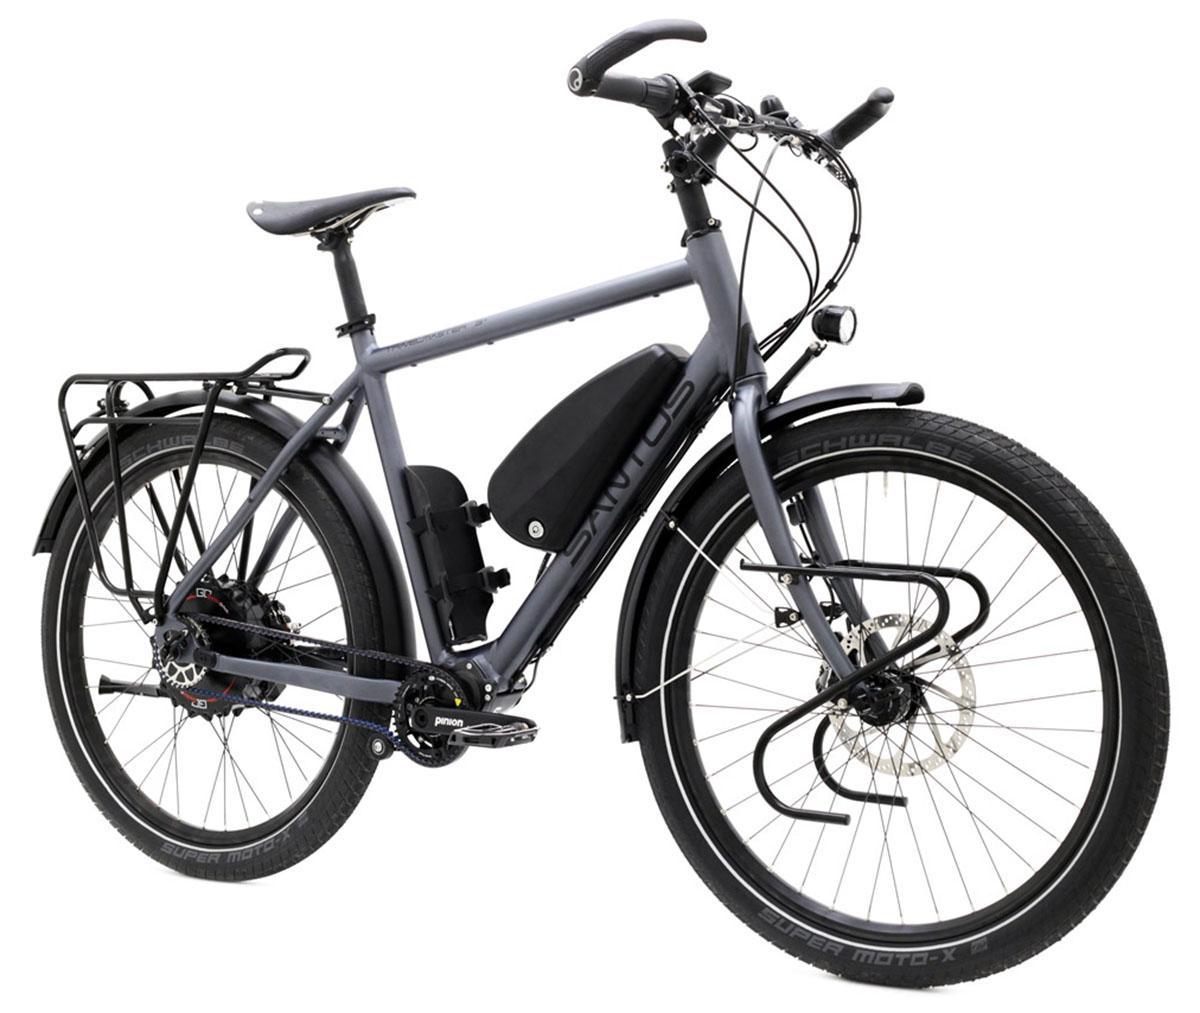 Santos Travelmaster 3 Plus E-bike